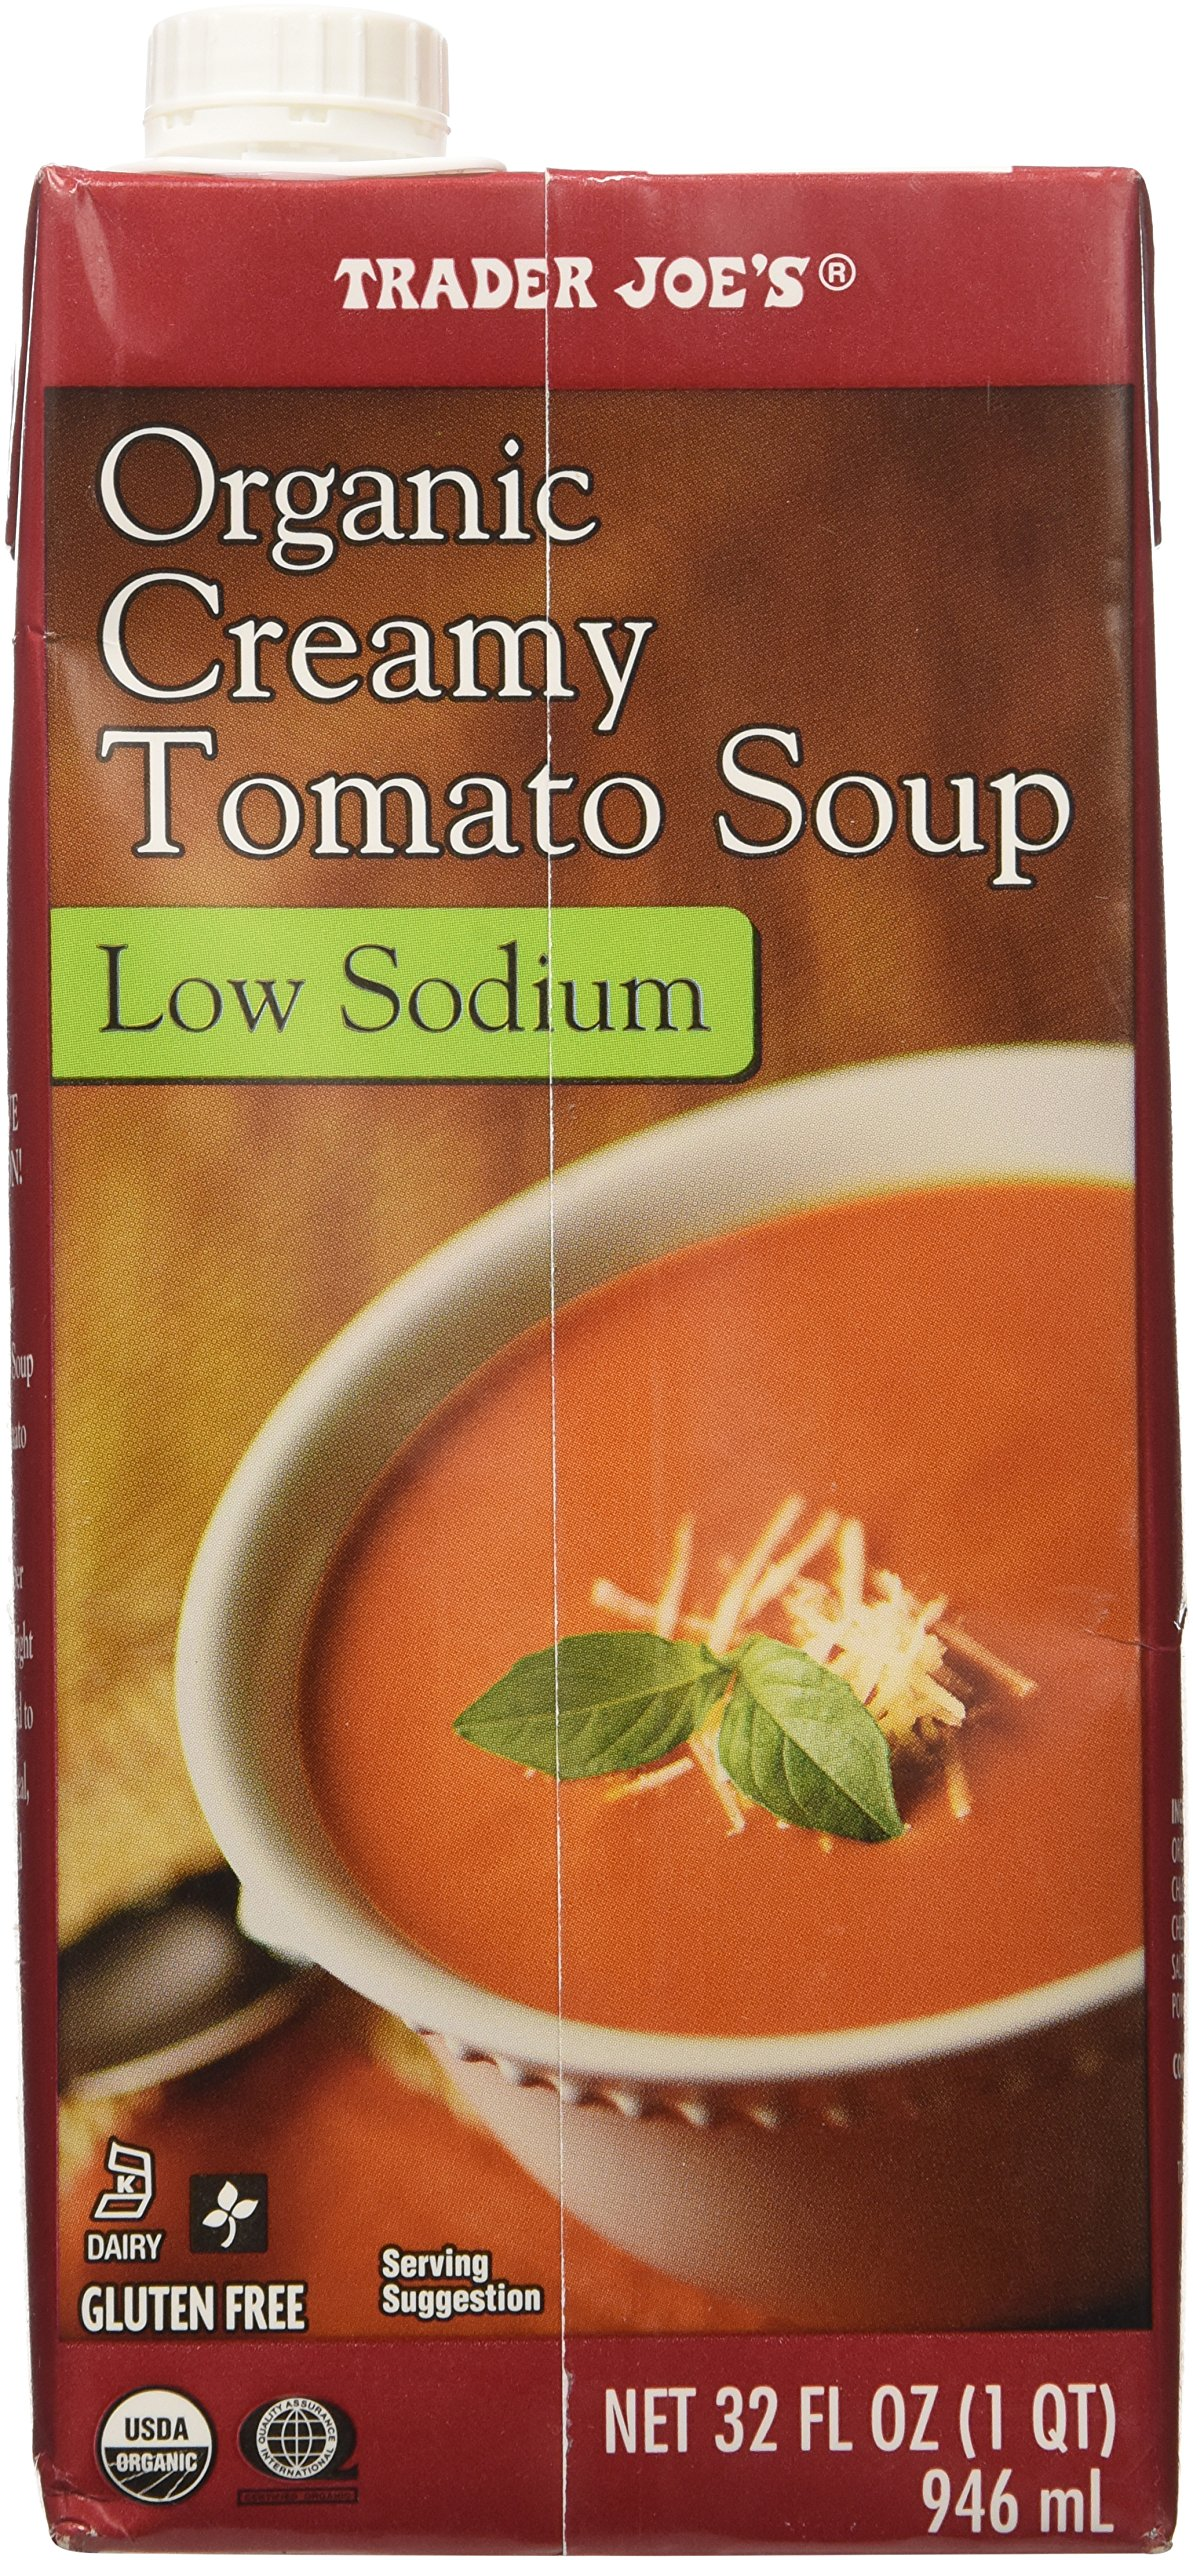 2 boxes of Trader Joe's Organic Creamy Tomato Soup Low Sodium Gluten Free